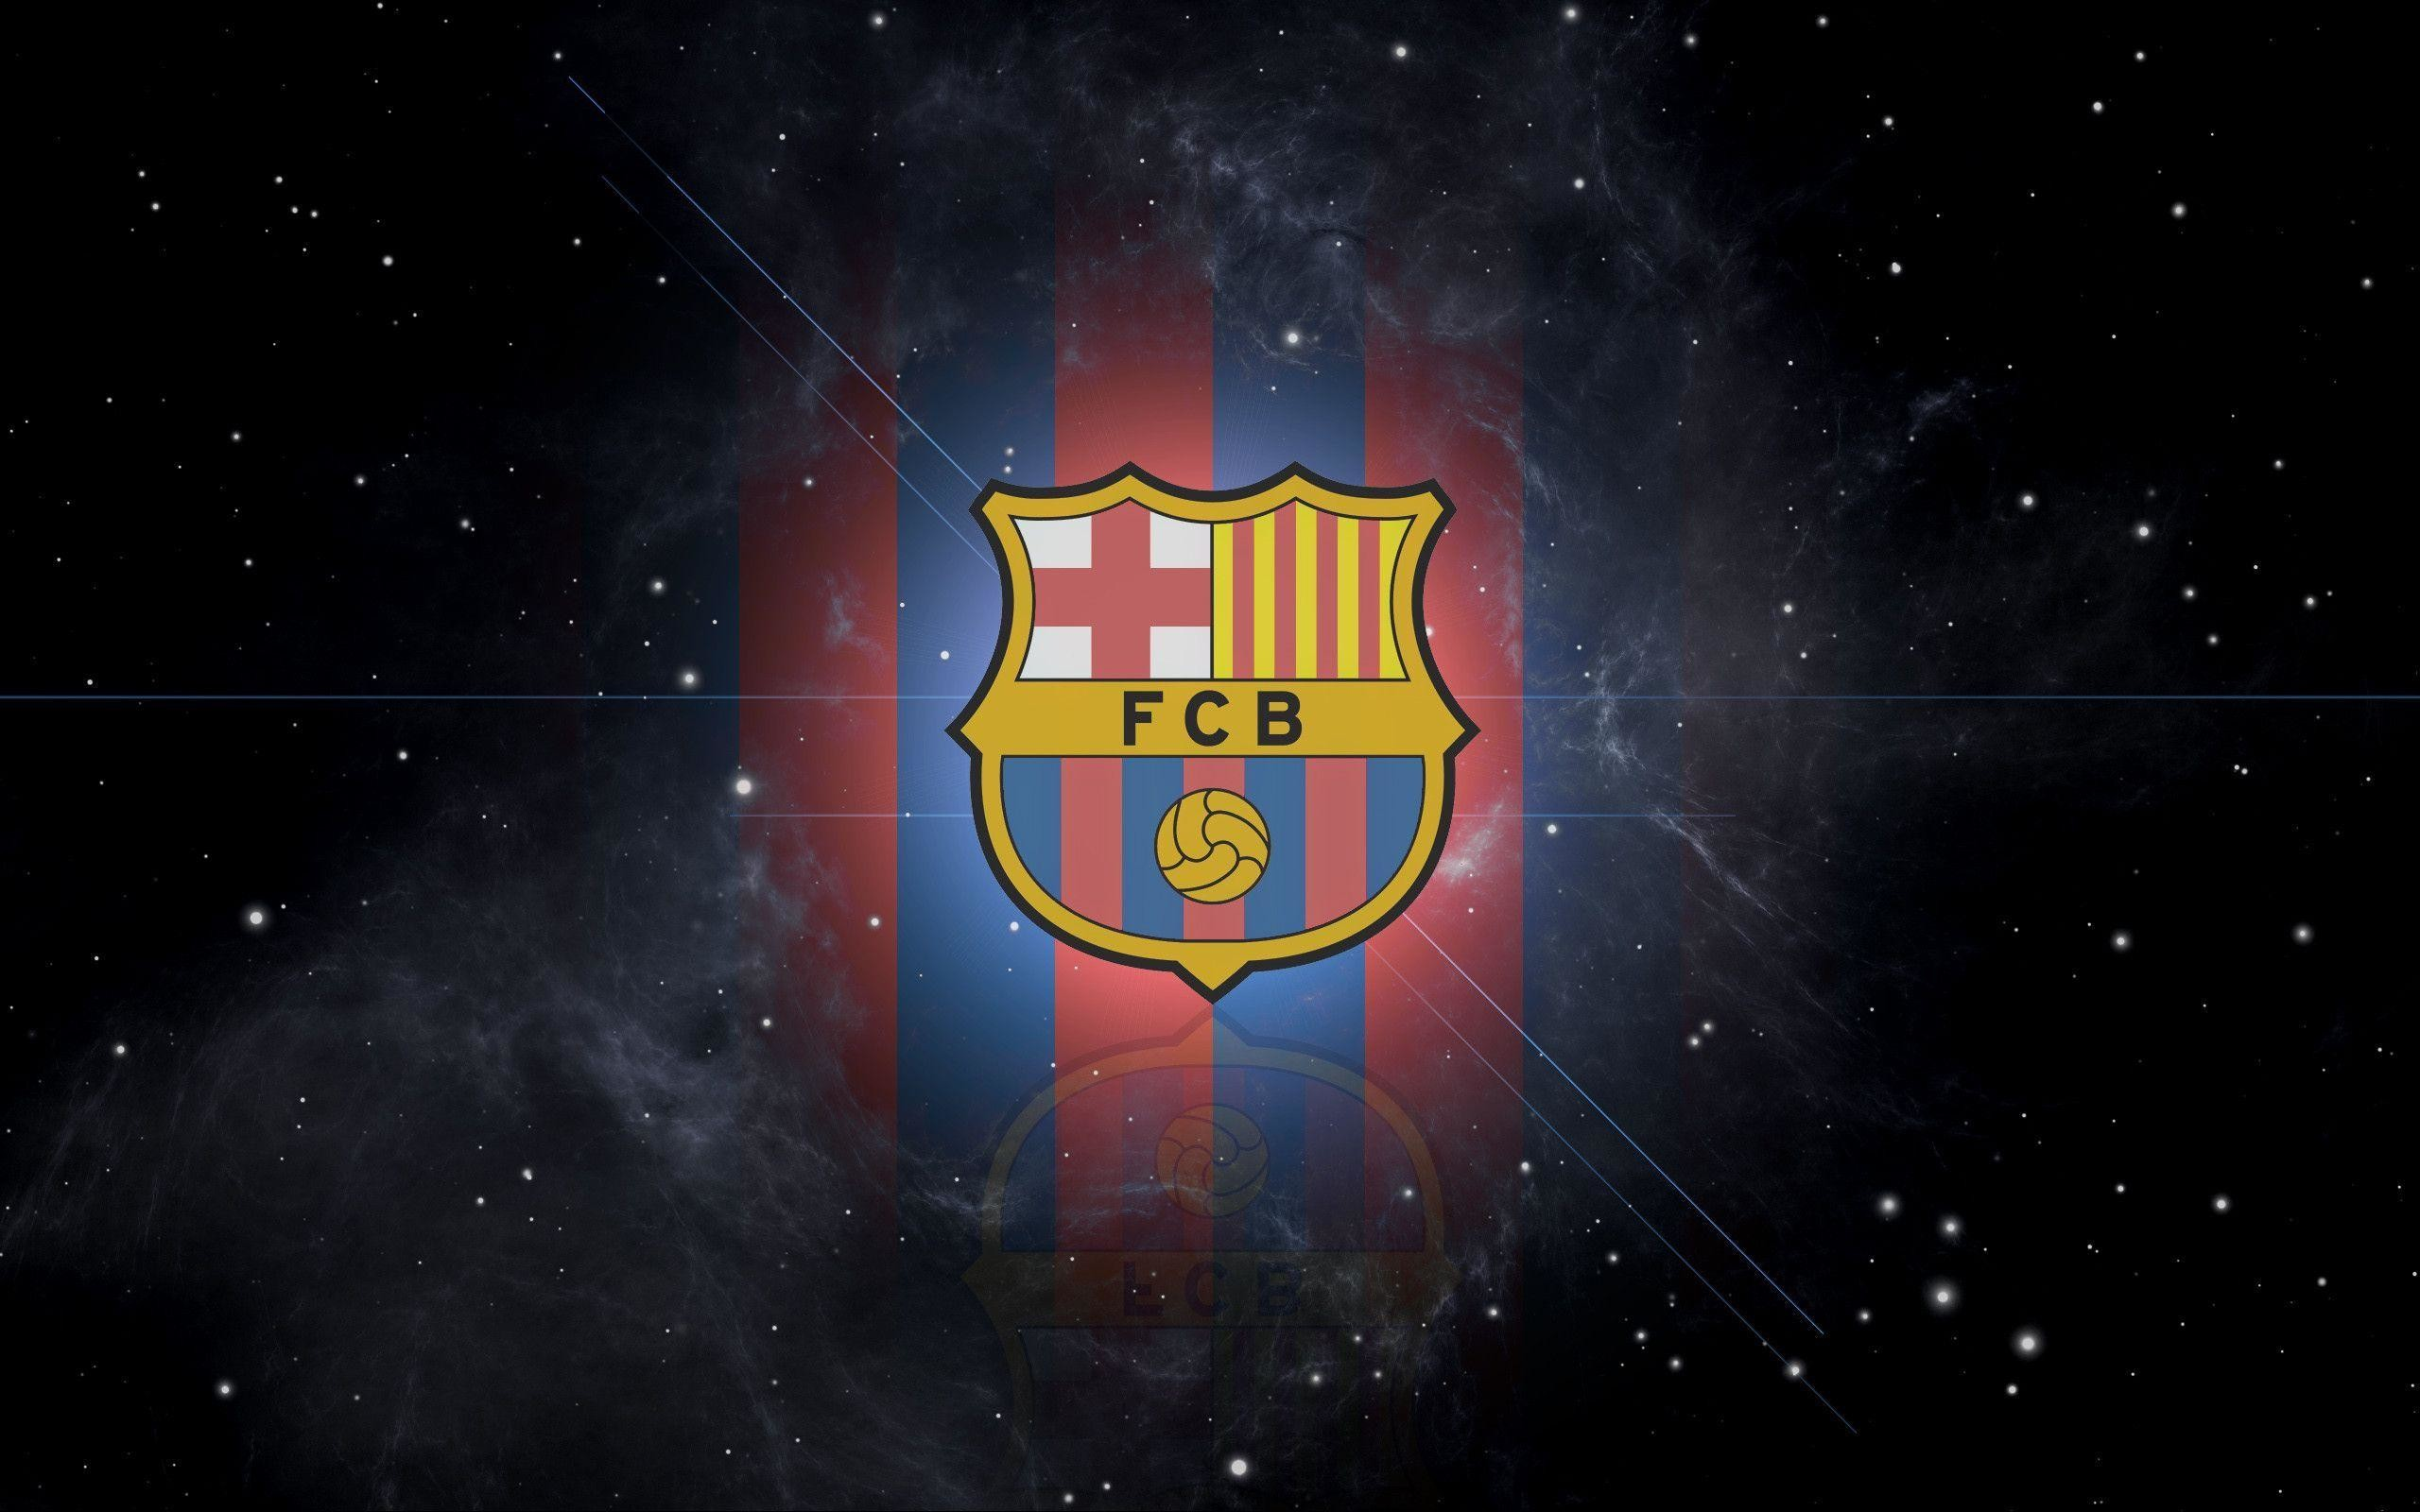 Sport Wallpaper Fc Barcelona: Fc Barcelona Logo Wallpaper ·① WallpaperTag